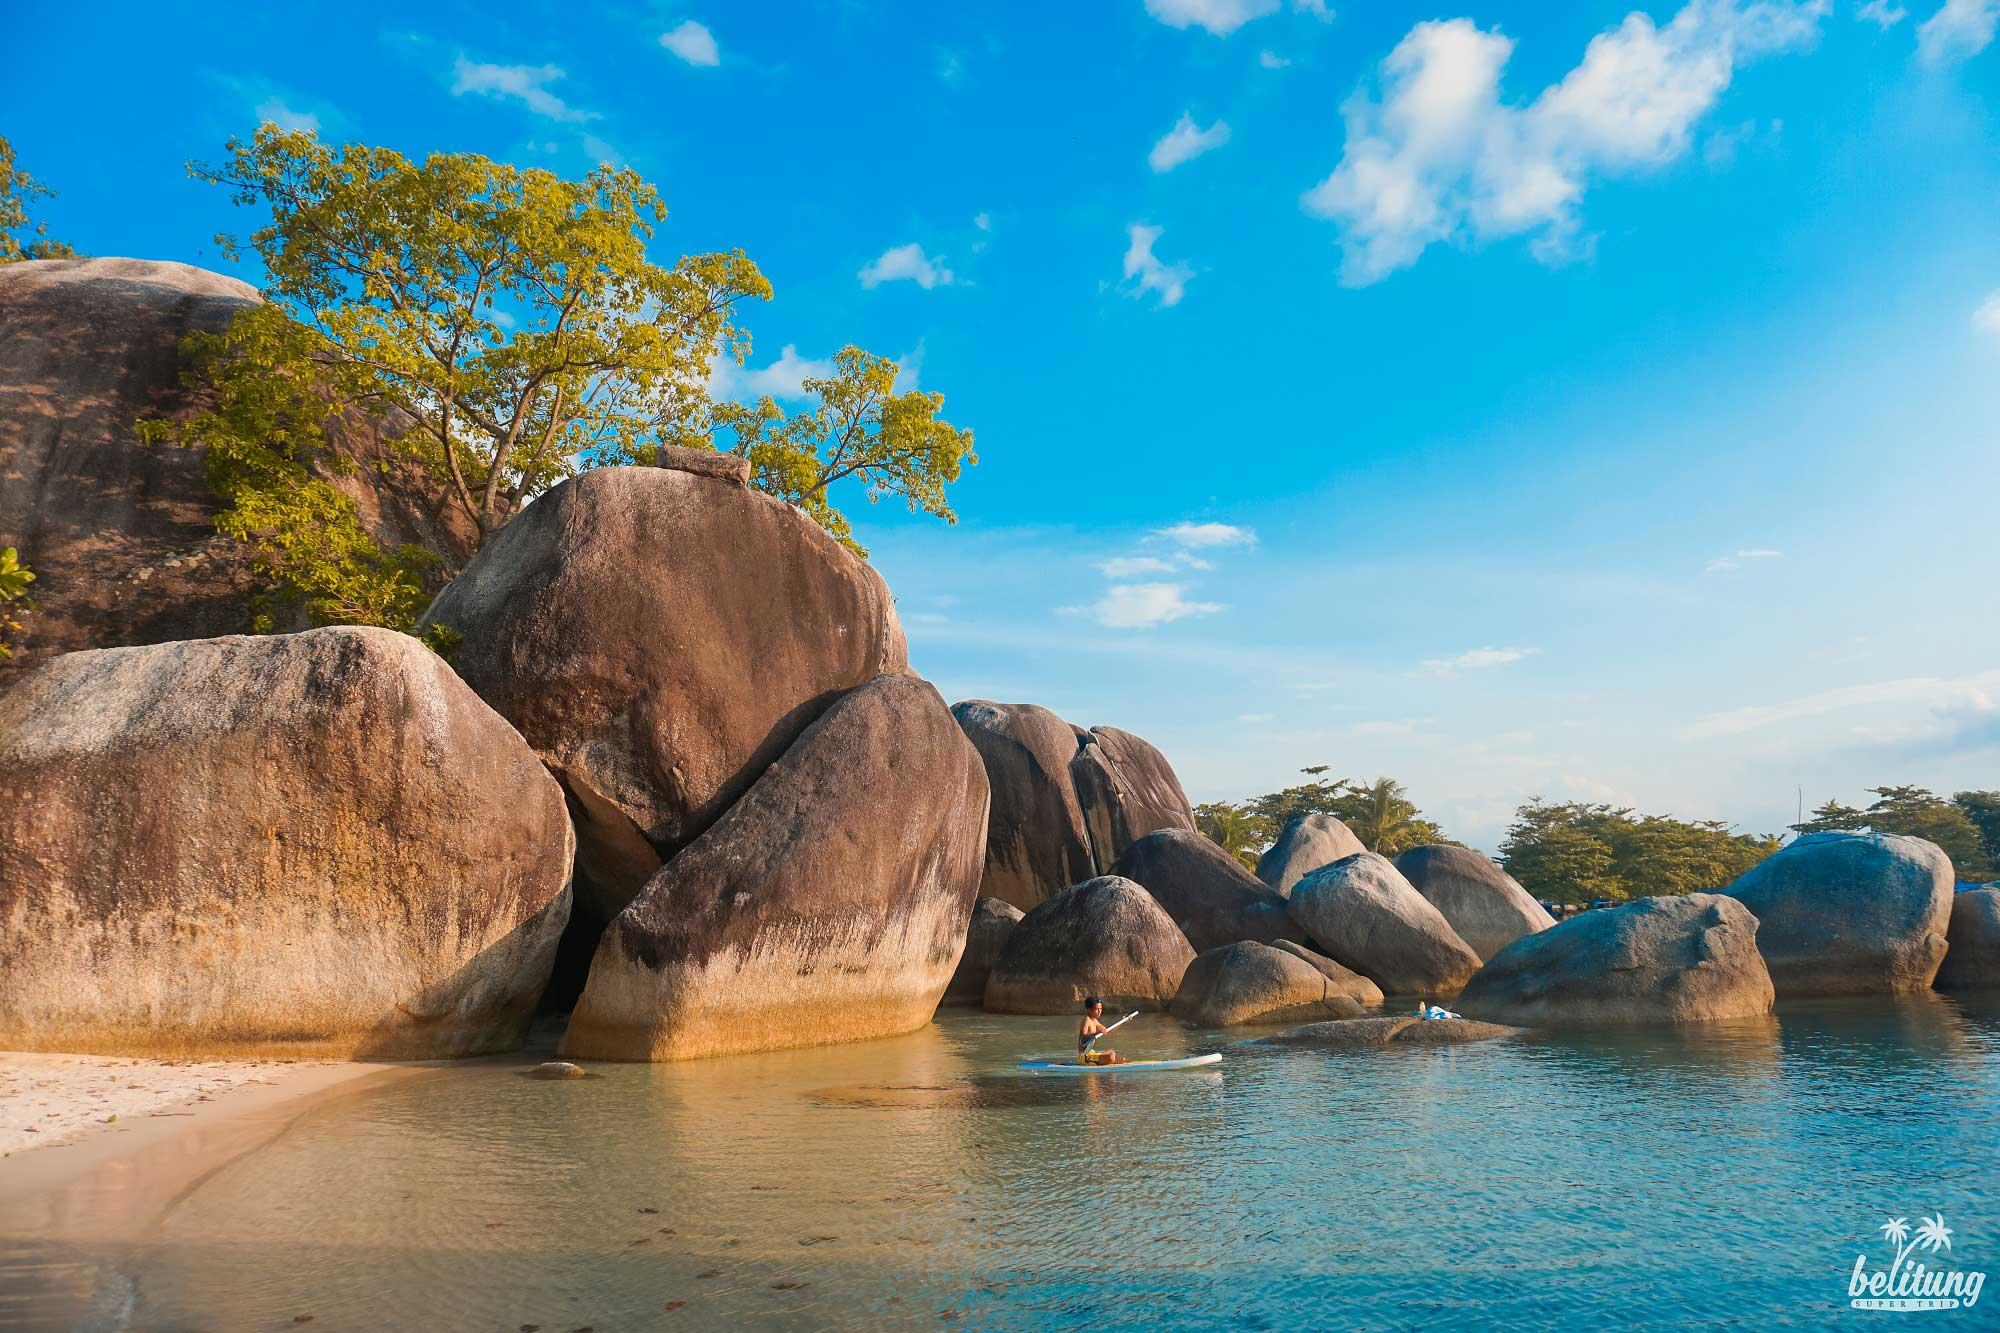 Tempat Wisata Belitung Bersama Belitungsupertrip